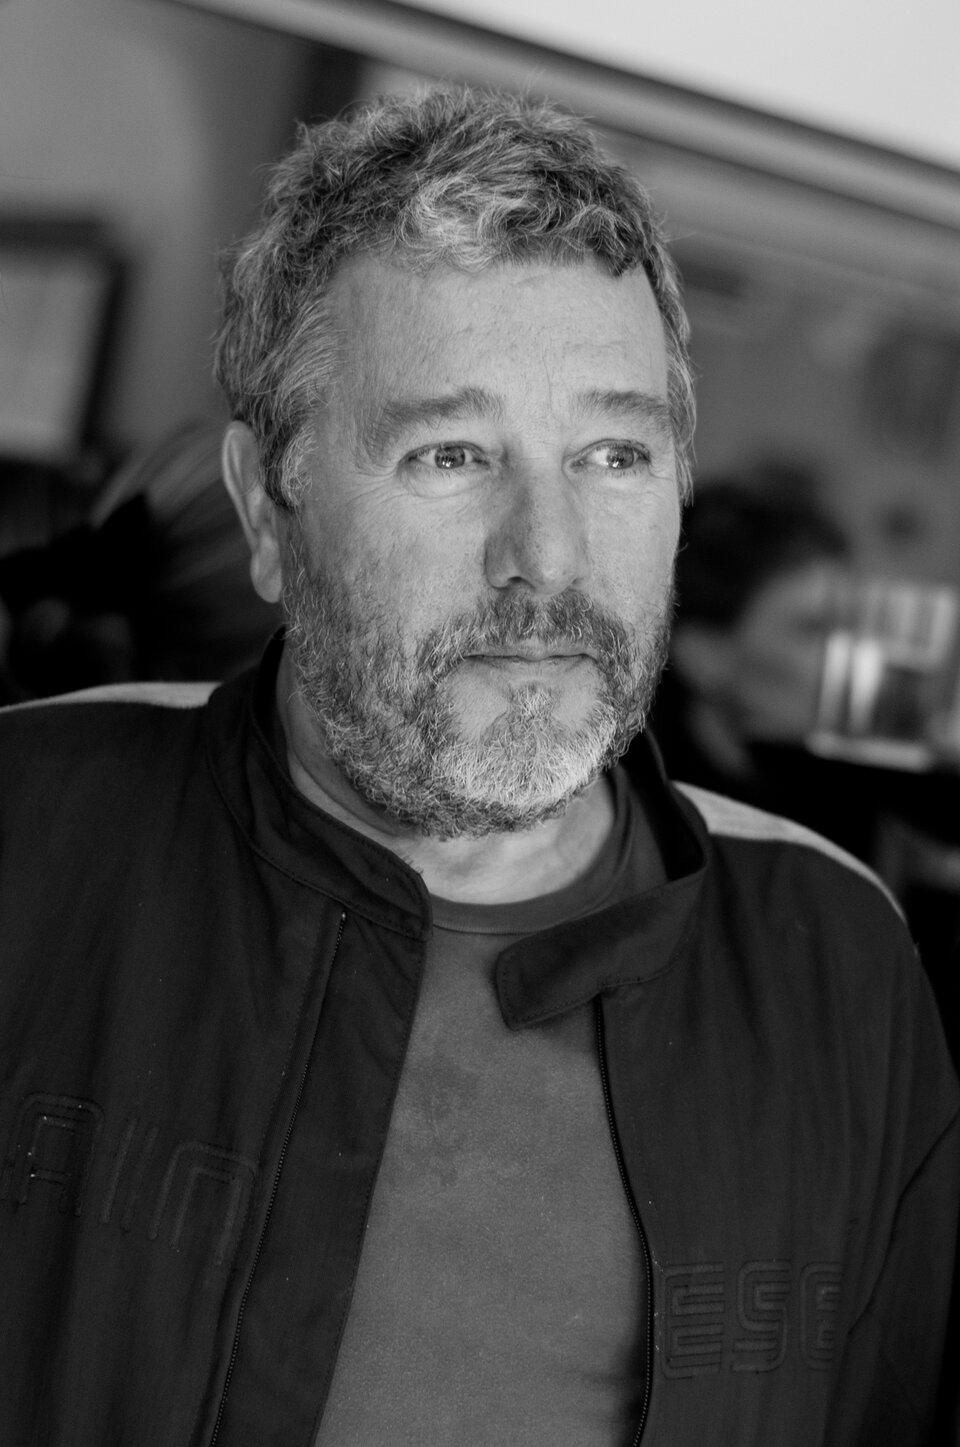 Philippe Starck Philippe Starck Źródło: jikatu, fotografia czarno-biała, licencja: CC BY-SA 2.0.